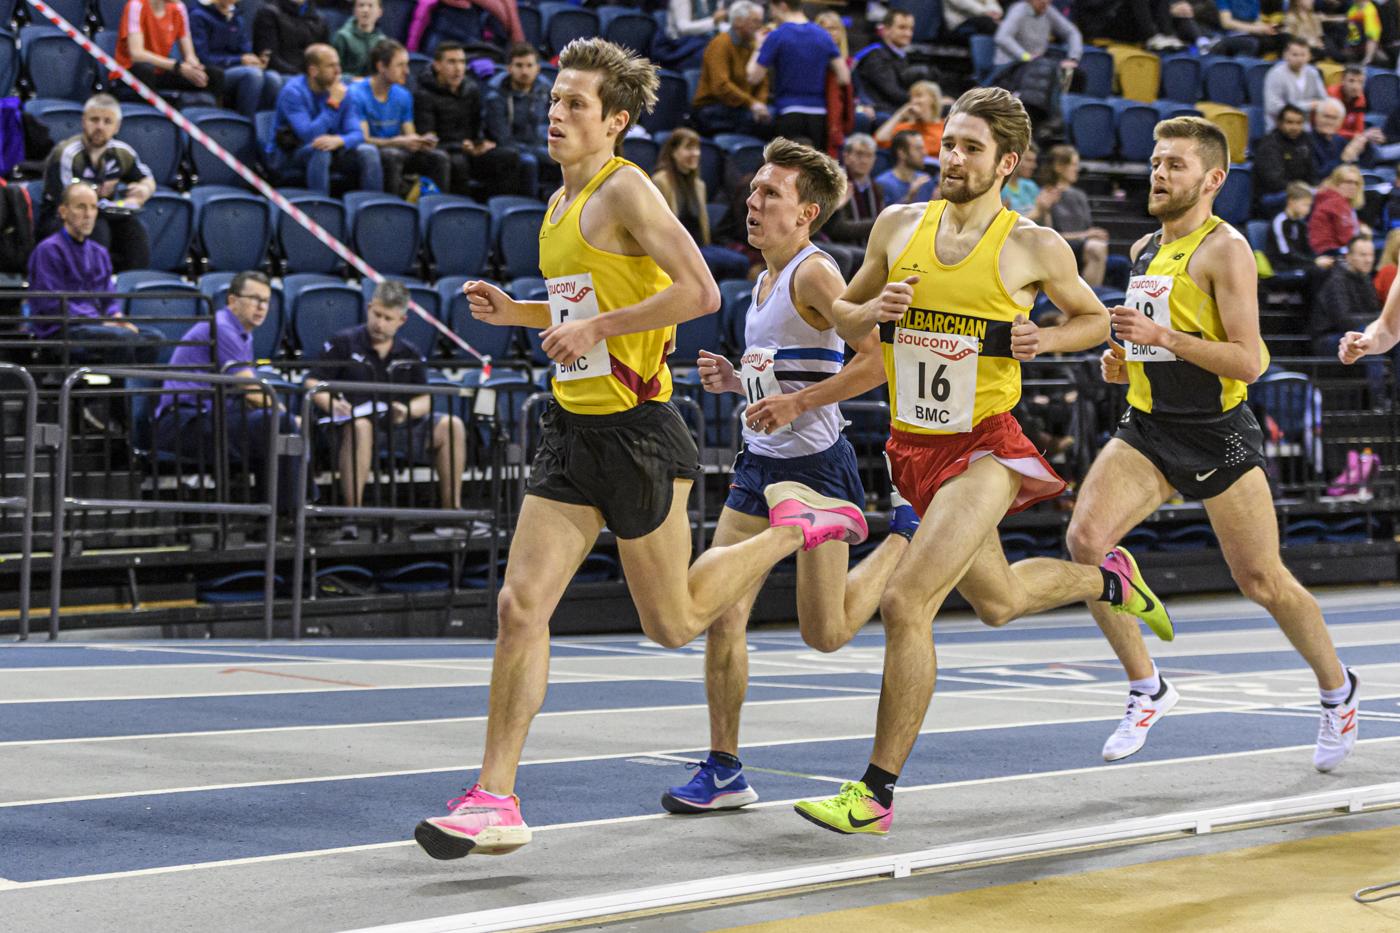 Stephen Mackay, left, runs in Glasgow.